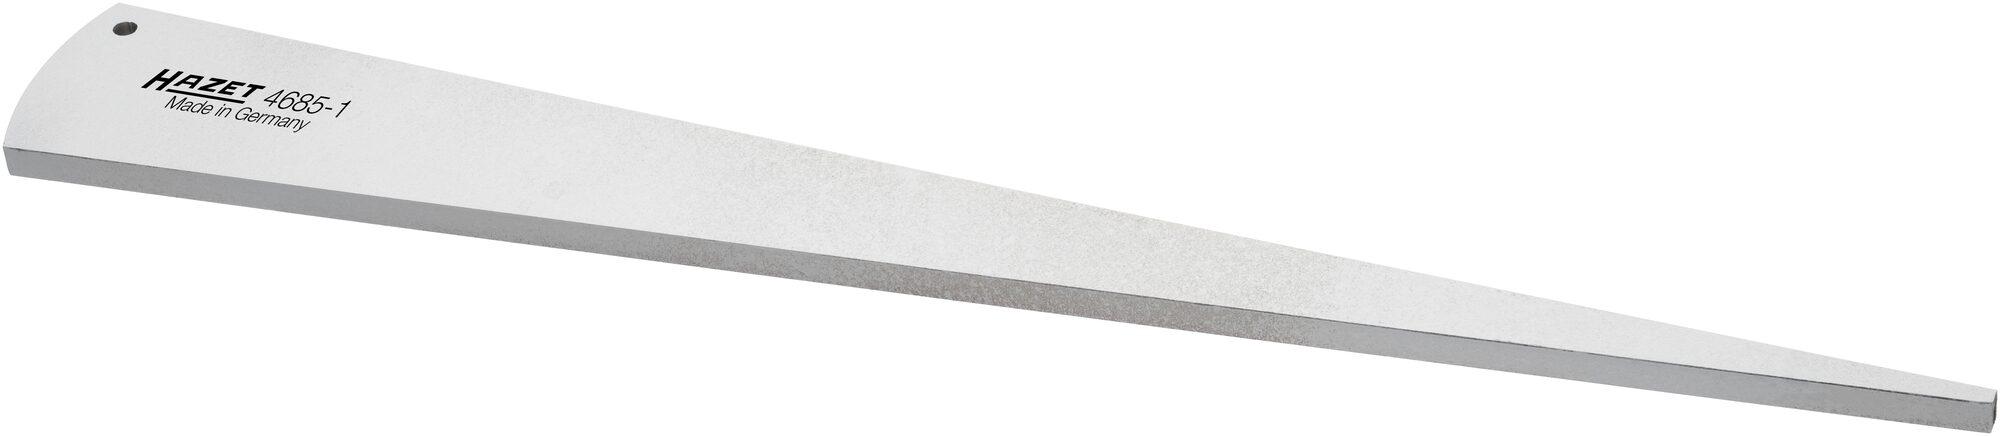 HAZET Nasenkeil-Ausdrücker 4685-1